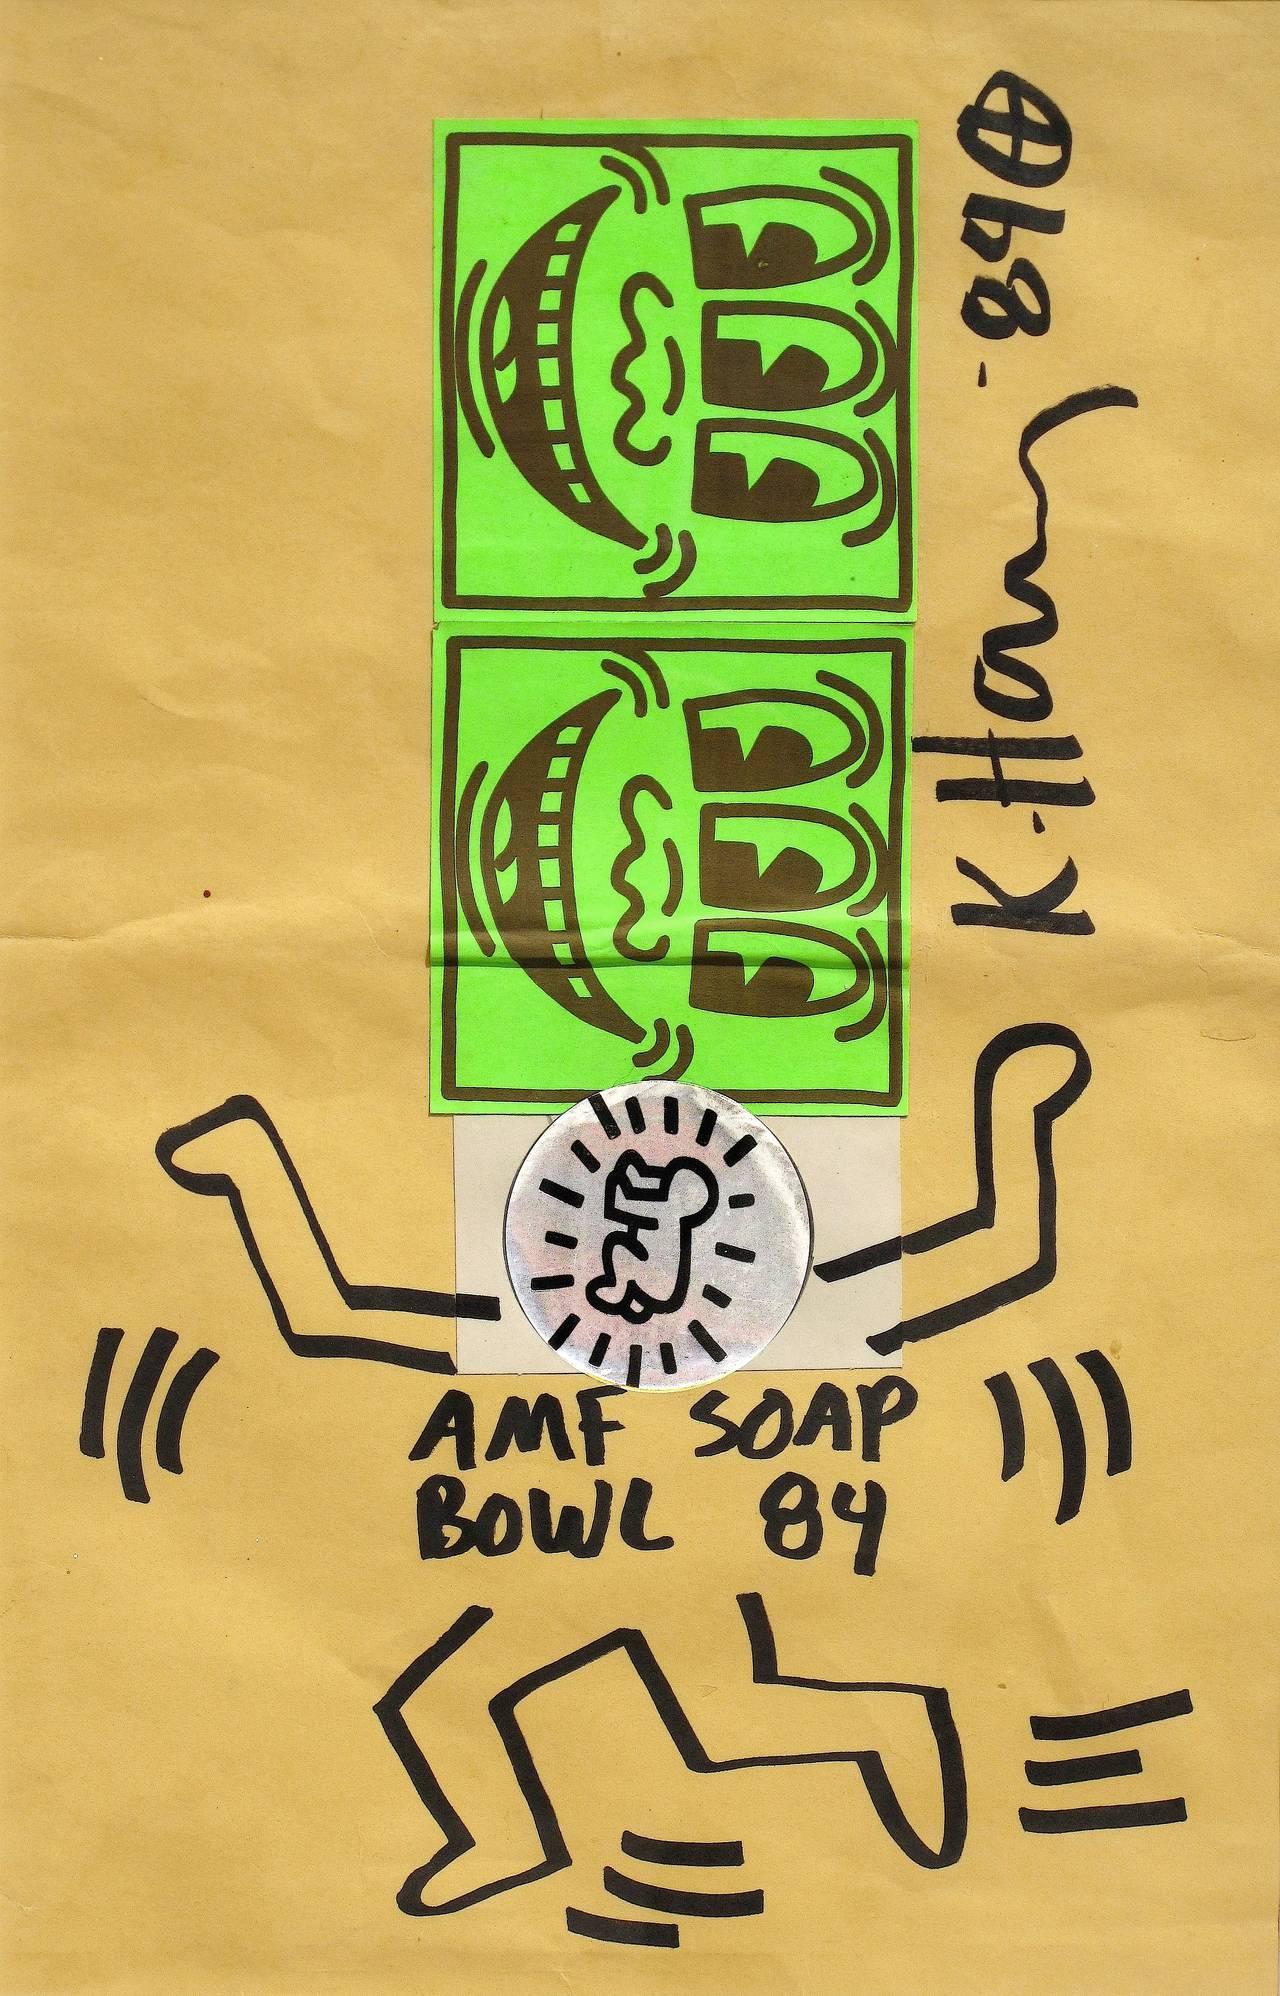 Untitled (Soap Bowl)